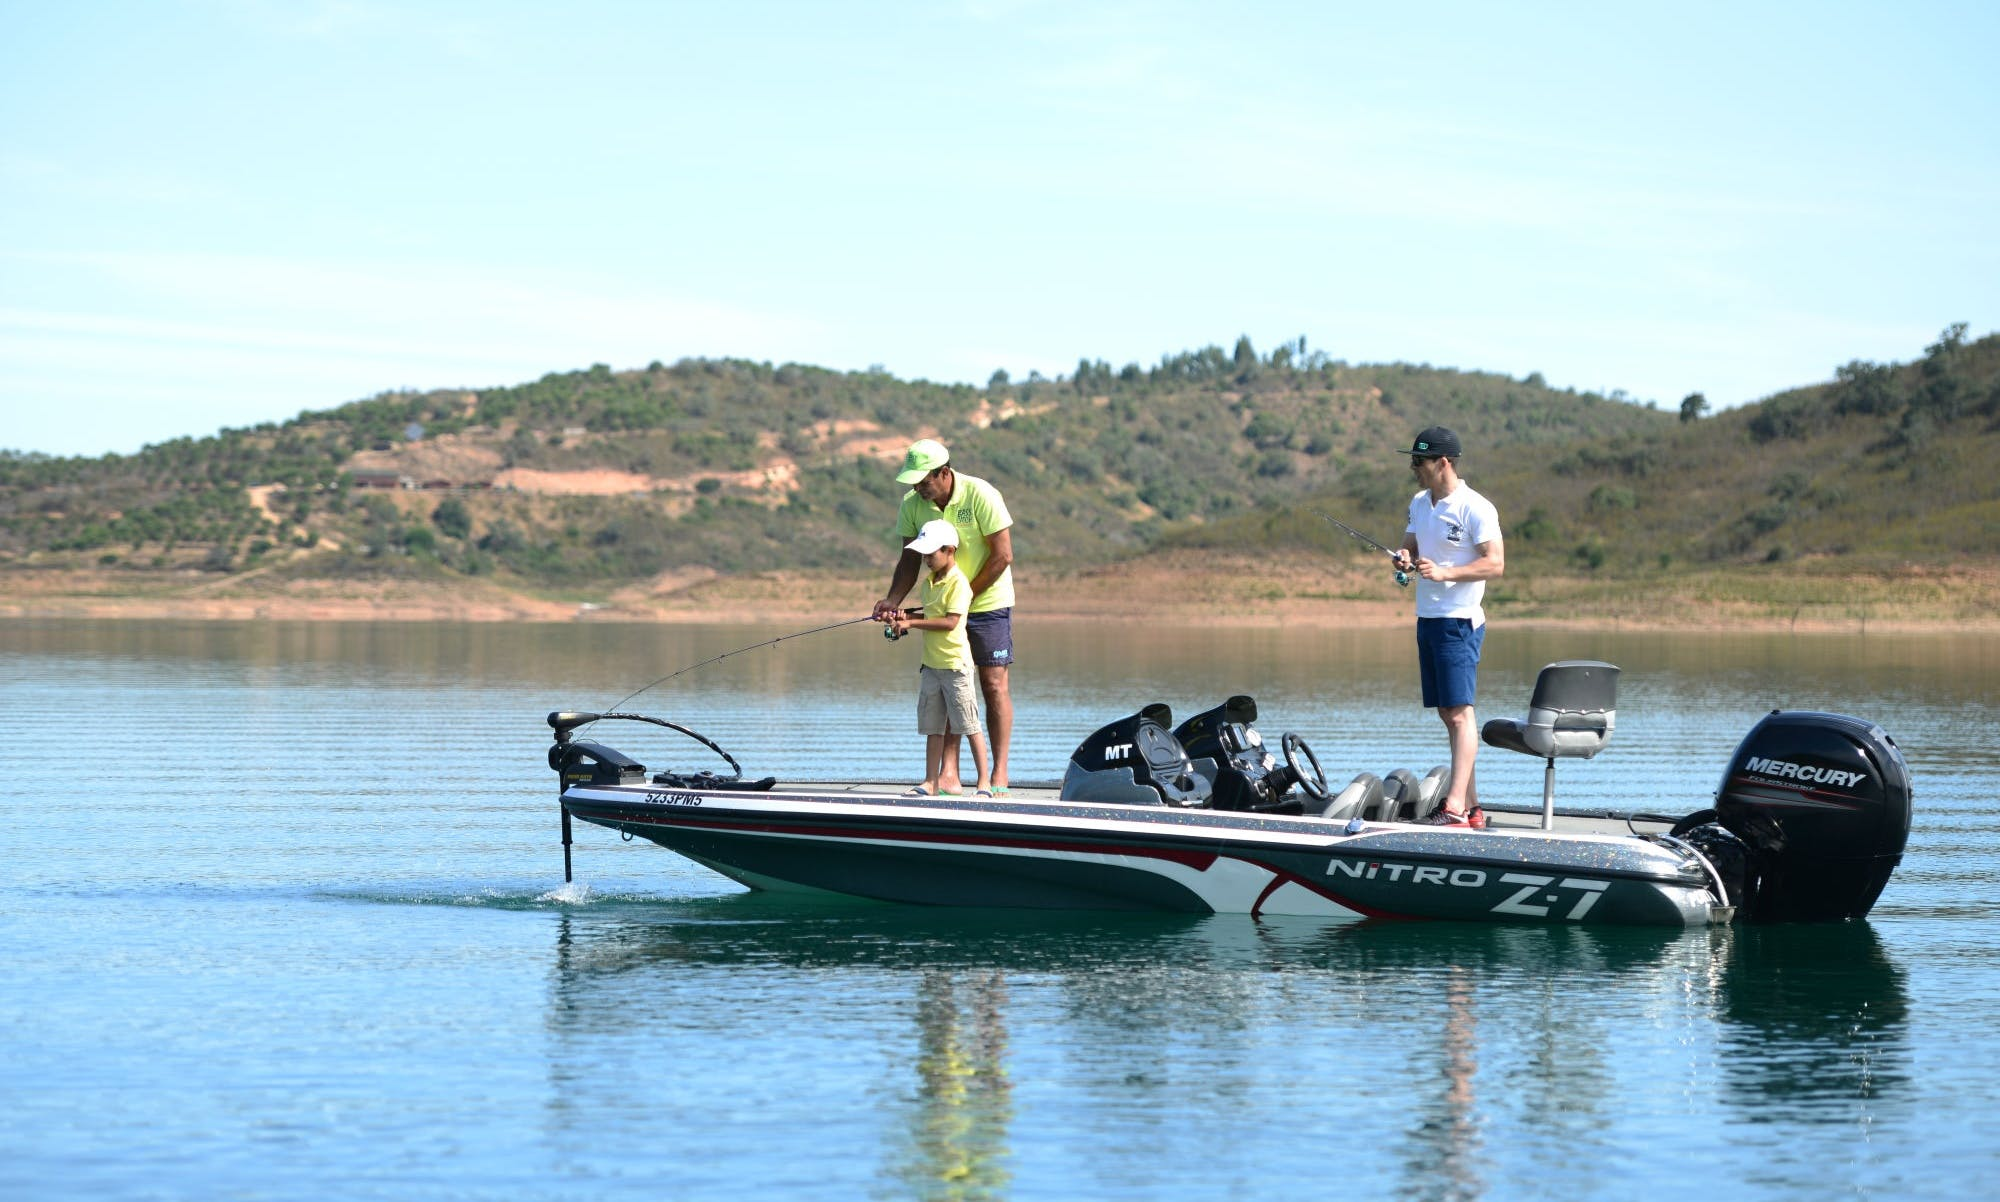 Guided Fishing in Barragem de Santa Clara, Portugal